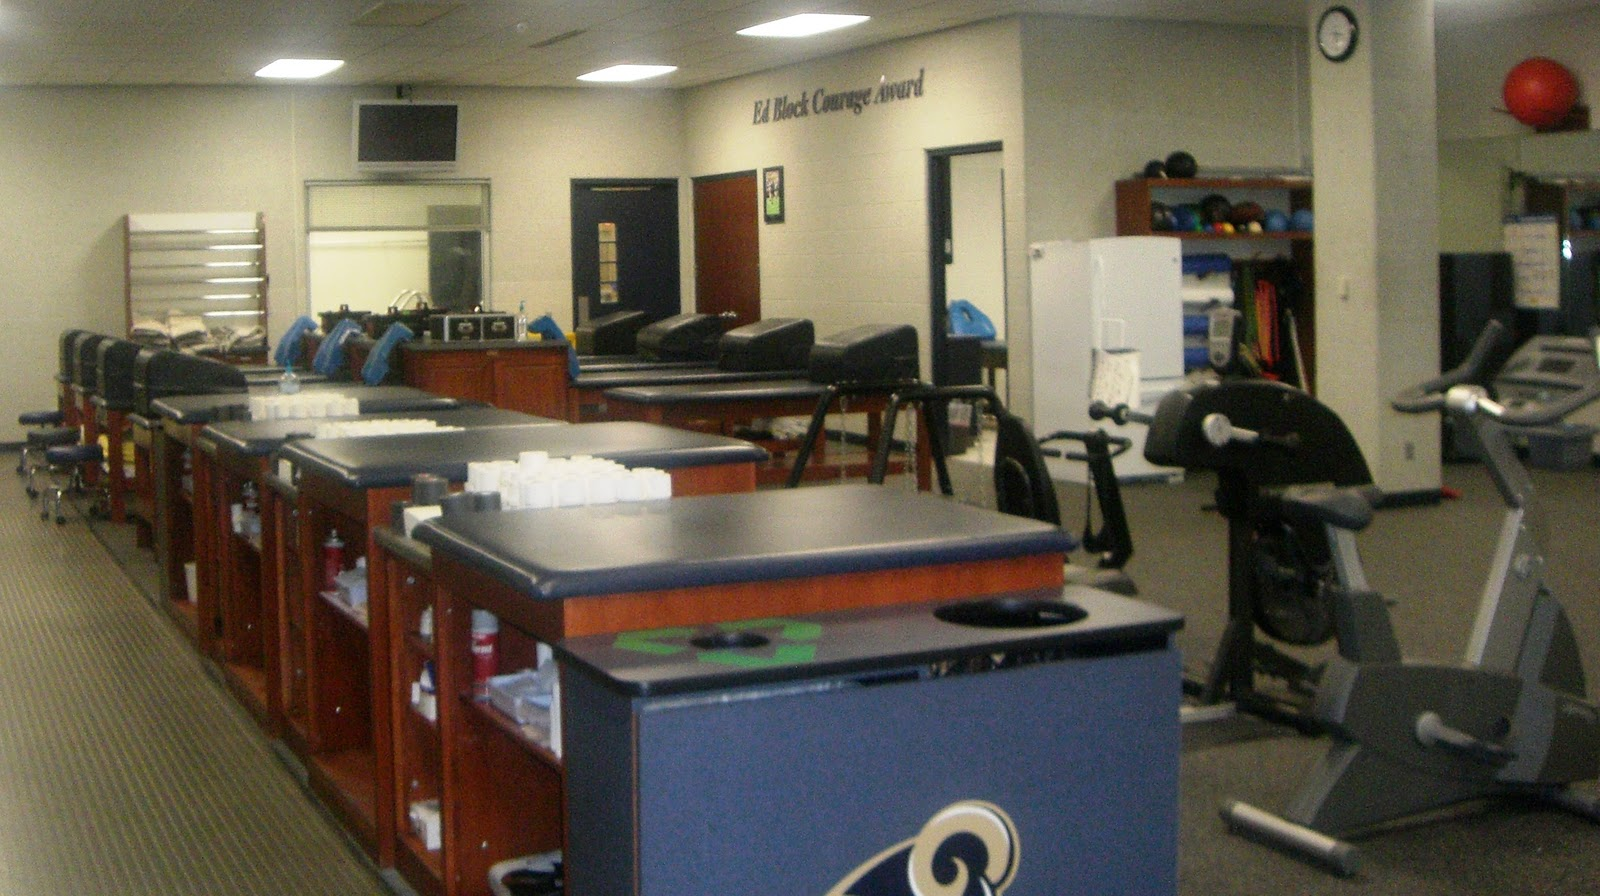 Saint Louis University Athletic Training Program SLU Athletic Training Students Get a Look at